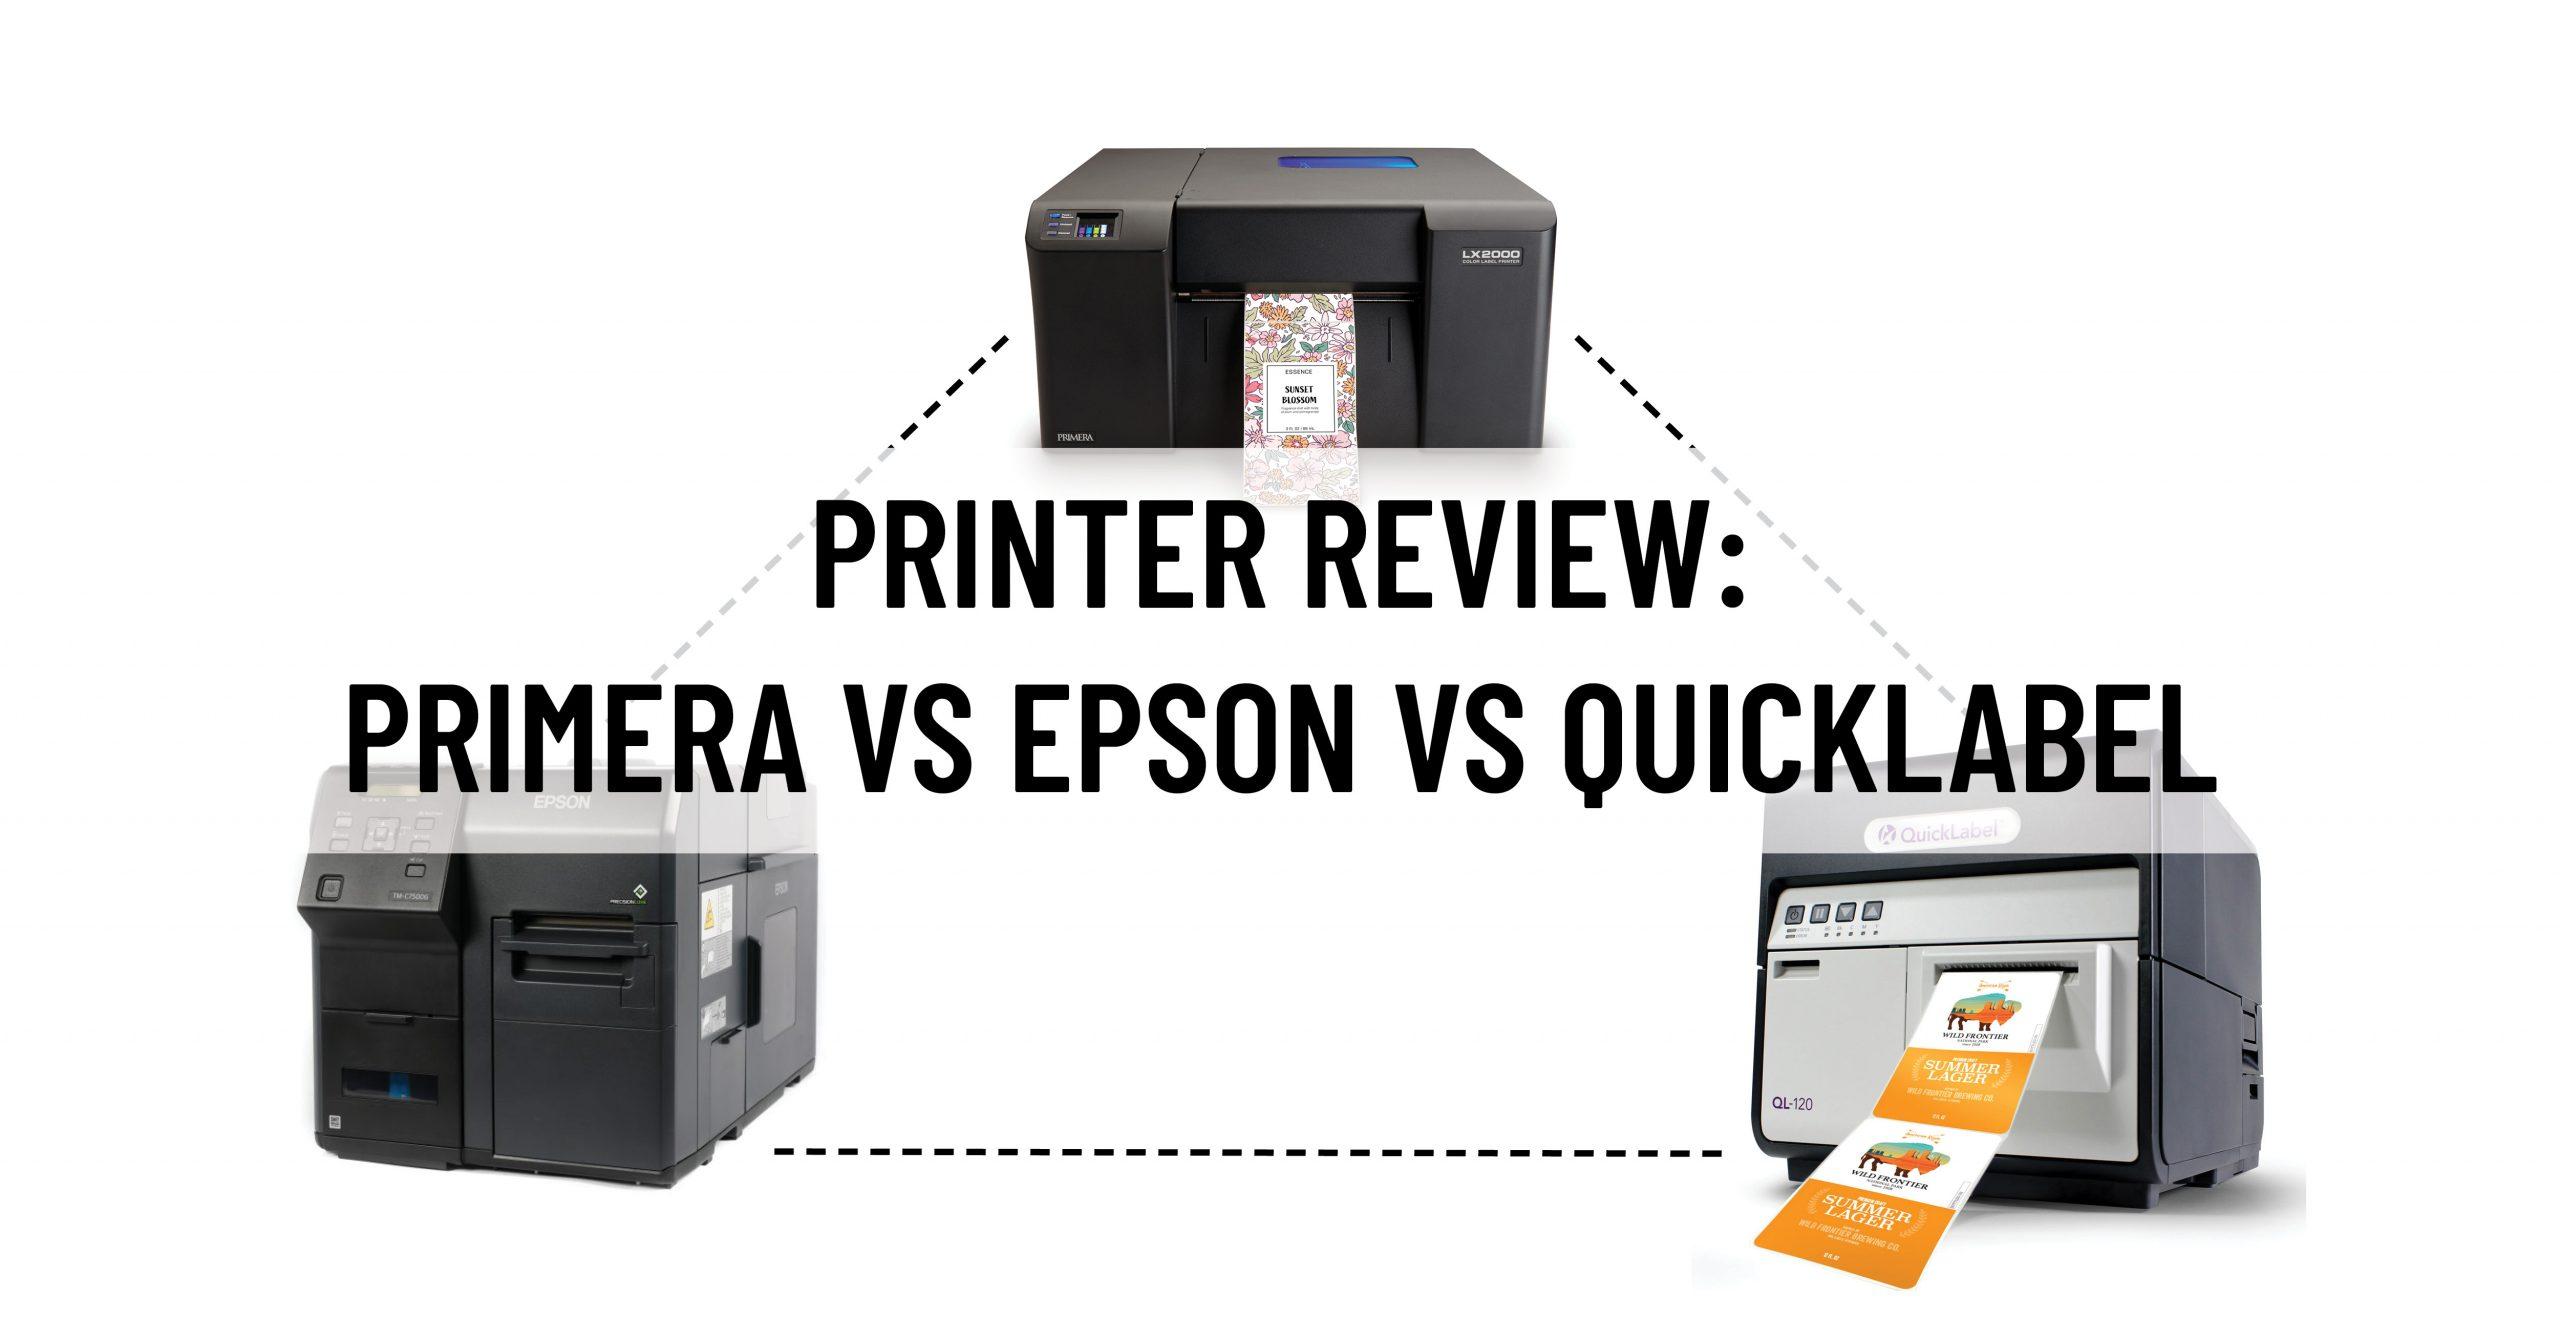 Primera vs. Epson vs. QuickLabel